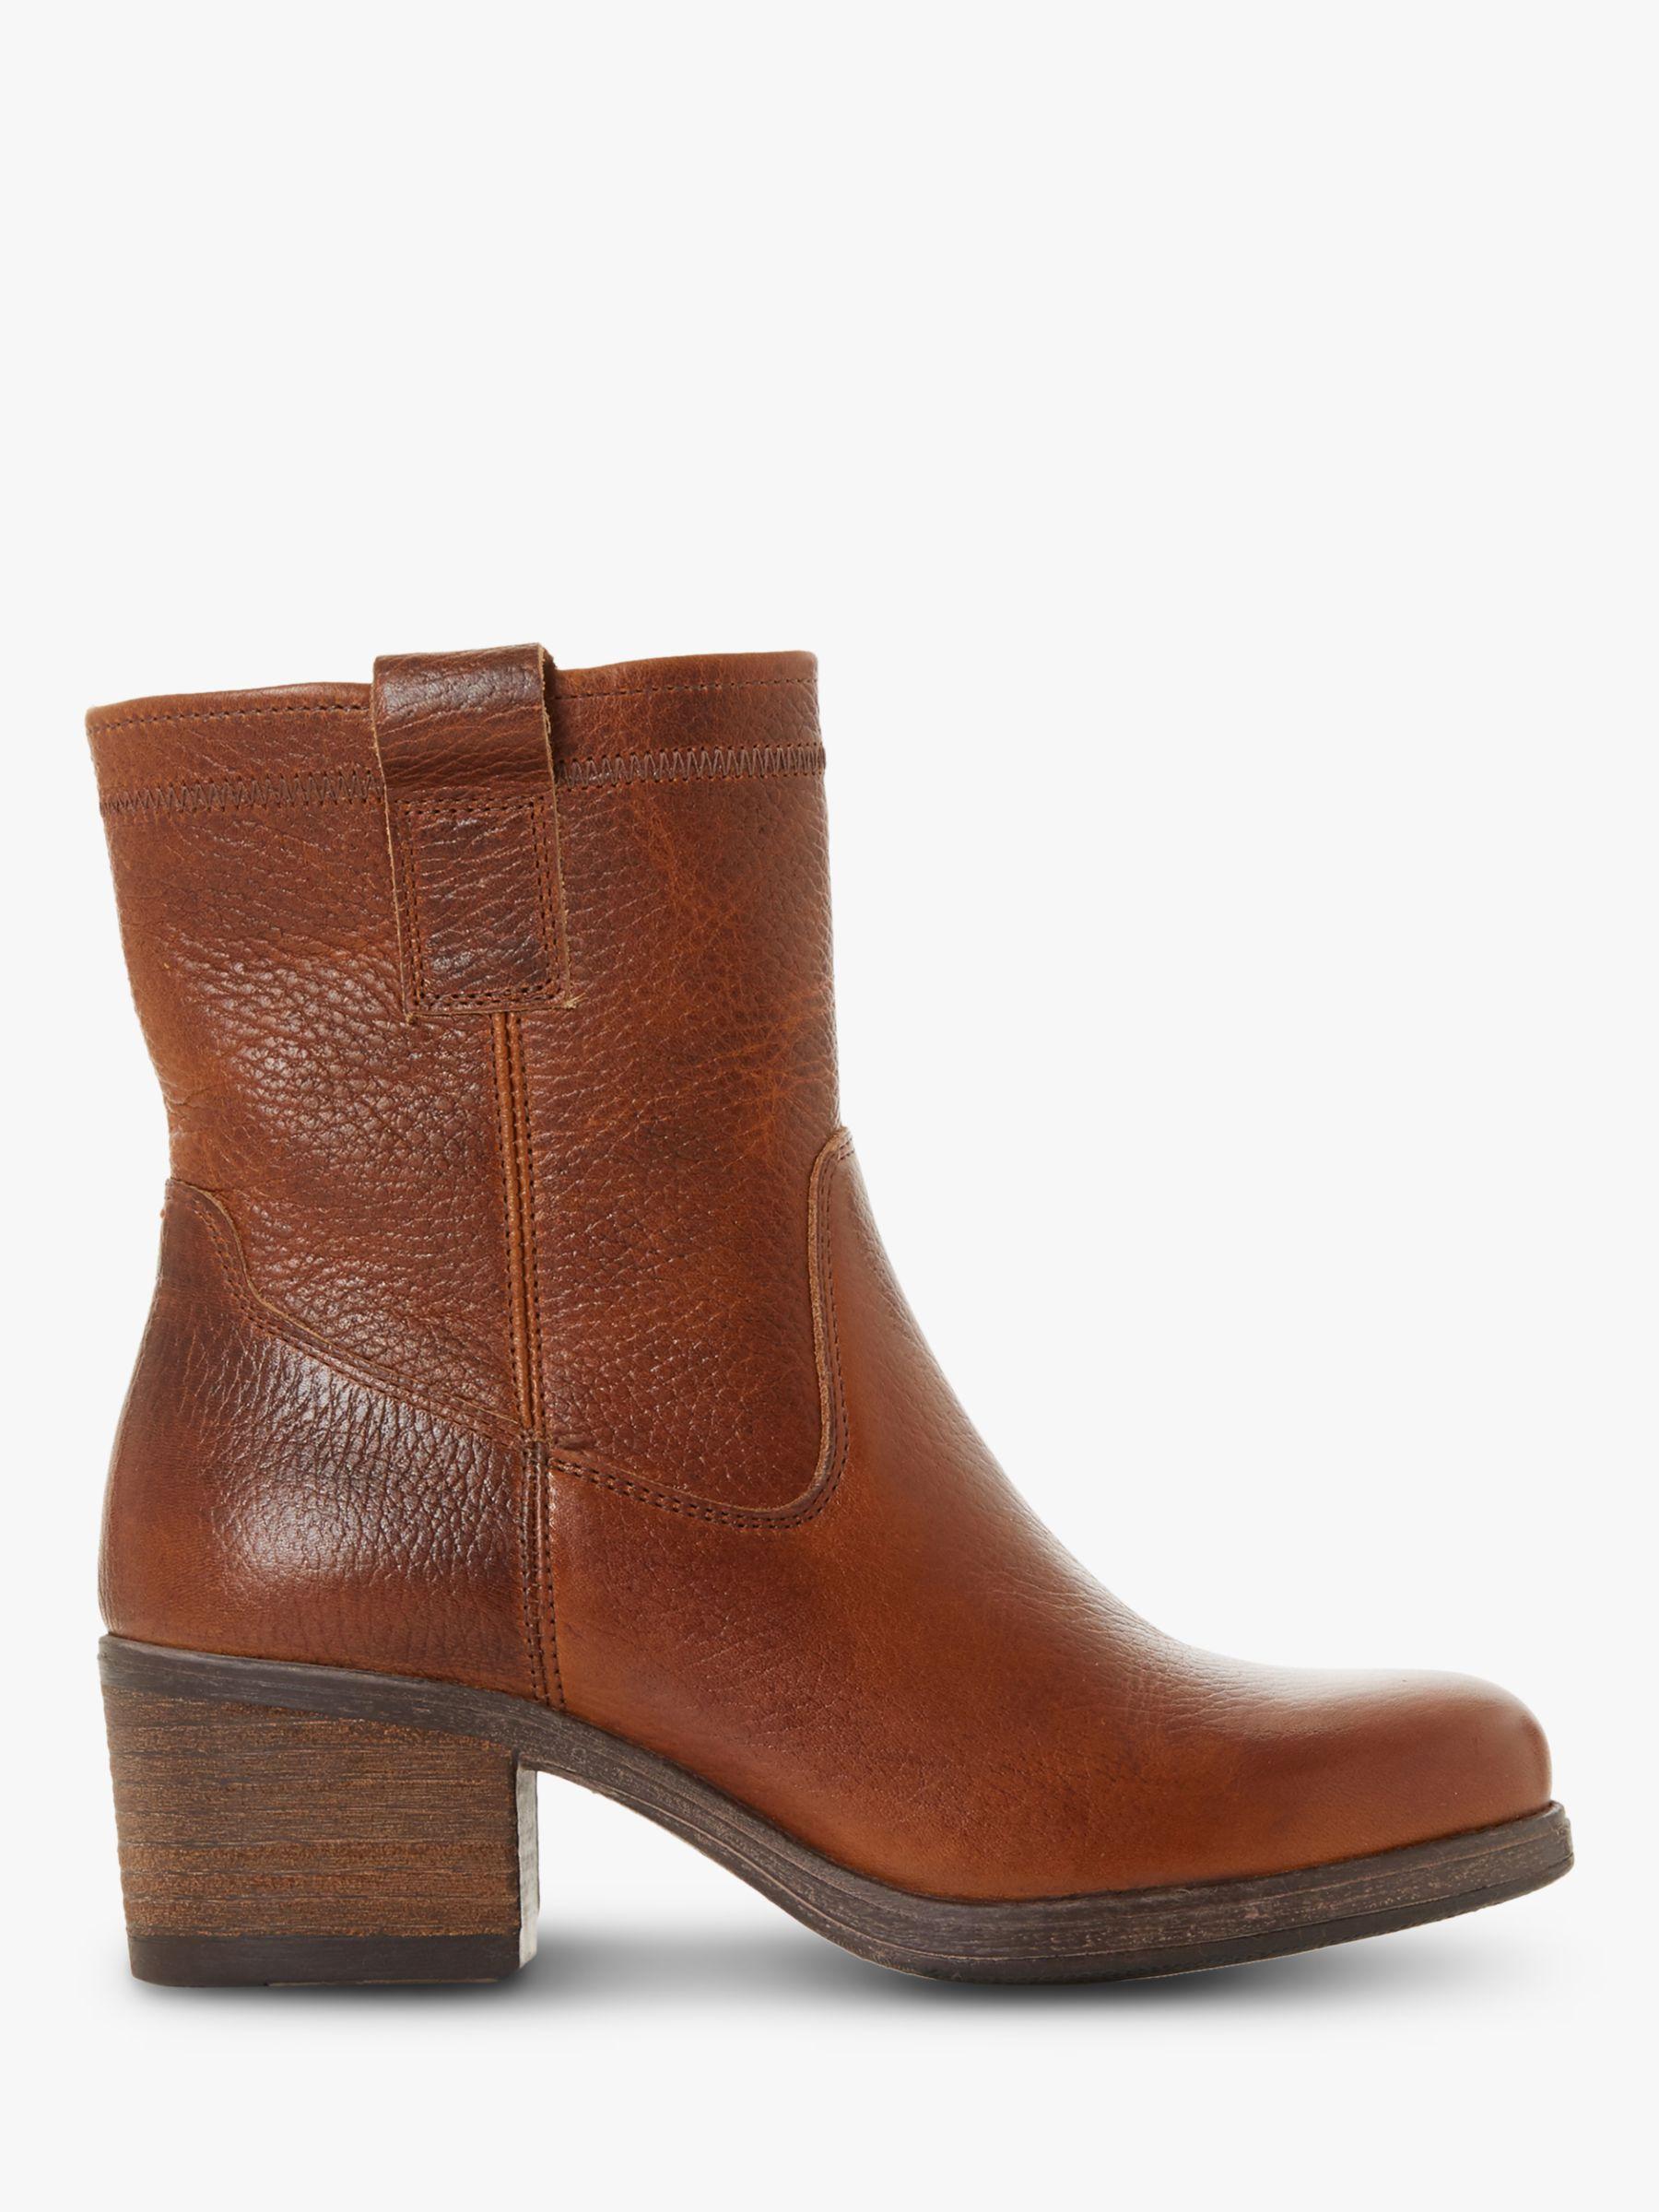 Bertie Bertie Pacer Leather Block Heeled Ankle Boots